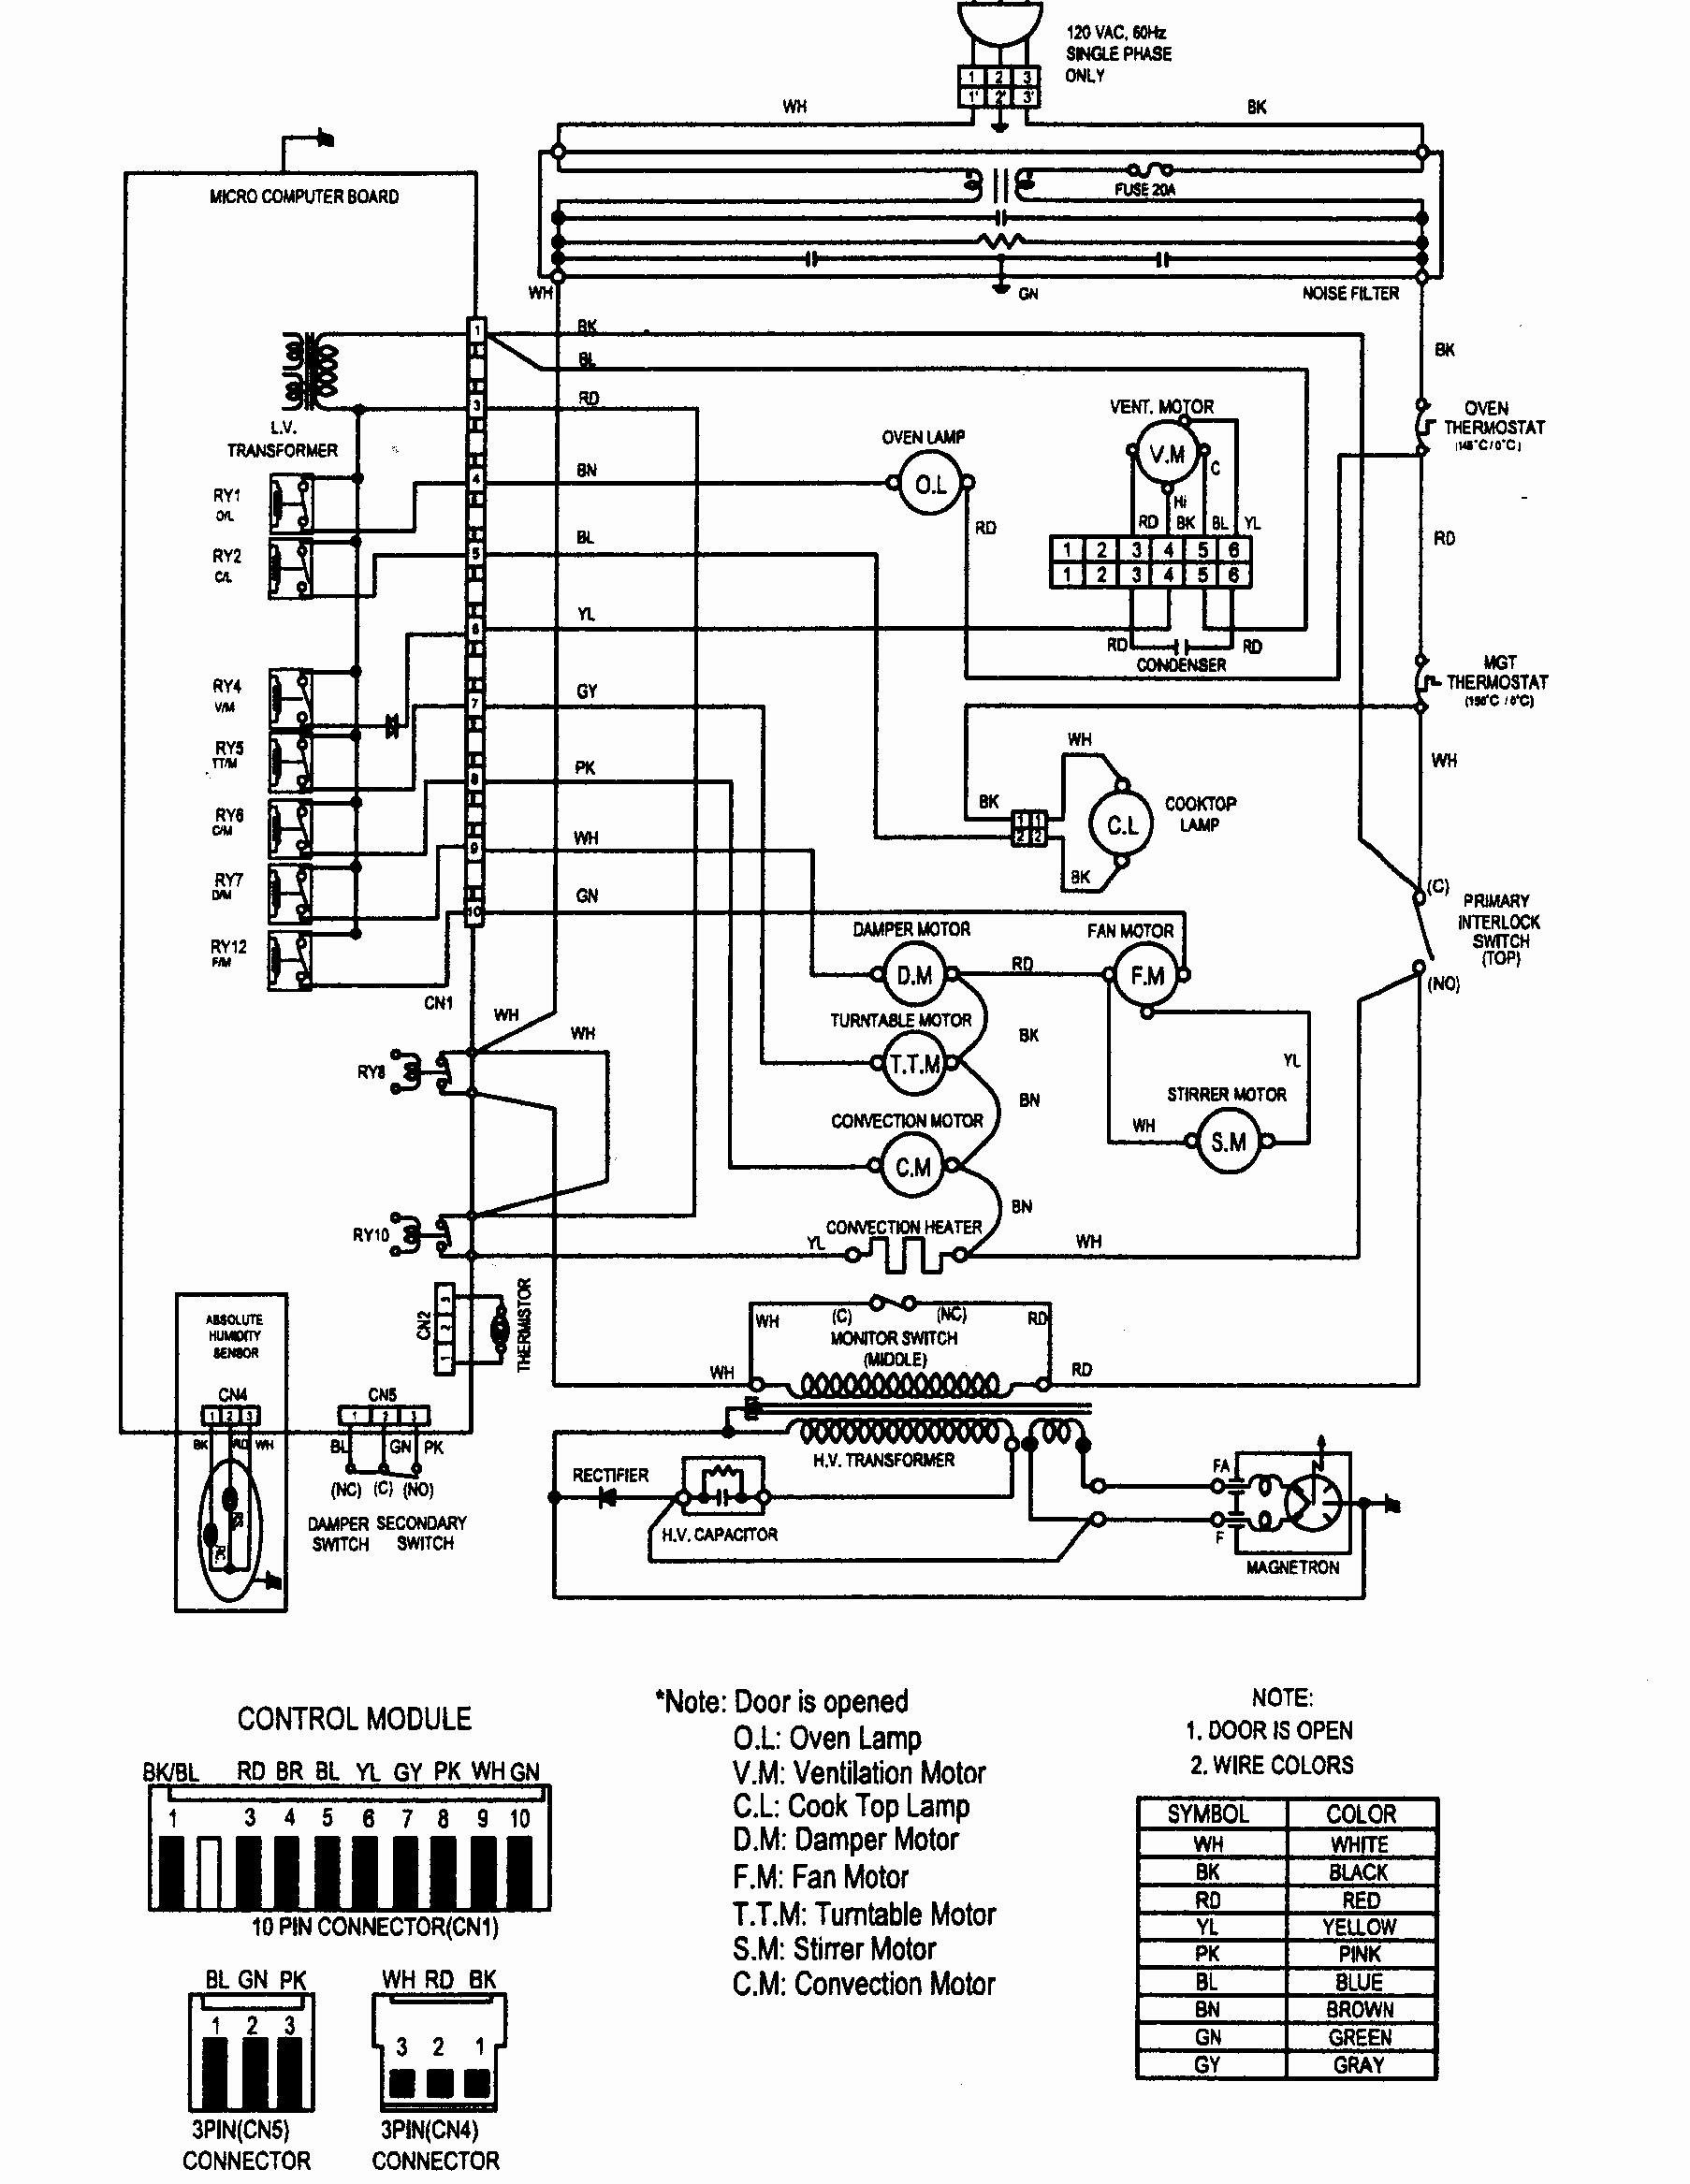 wiring diagram for kenmore washer wiring diagrams folder Kenmore Model 110 Wiring Diagram wiring diagram for kenmore washer